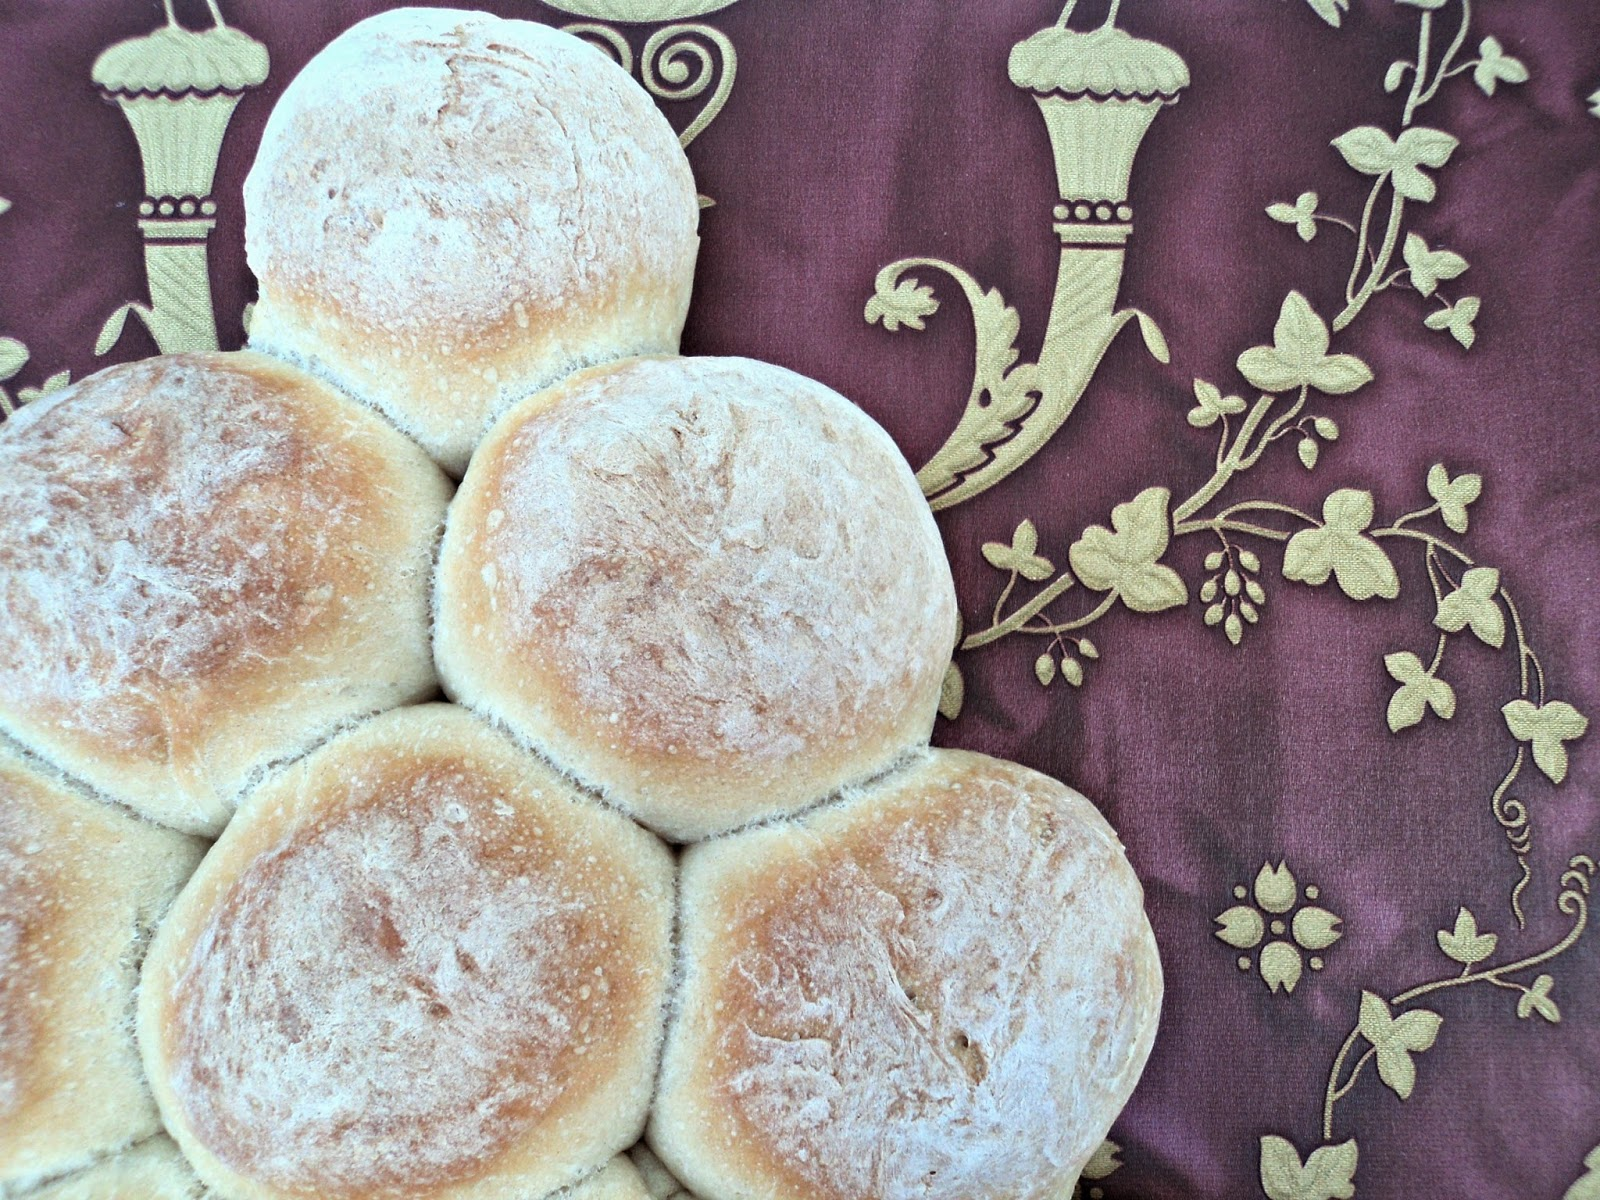 bollitos de pan en forma abeto de Navidad, receta casera